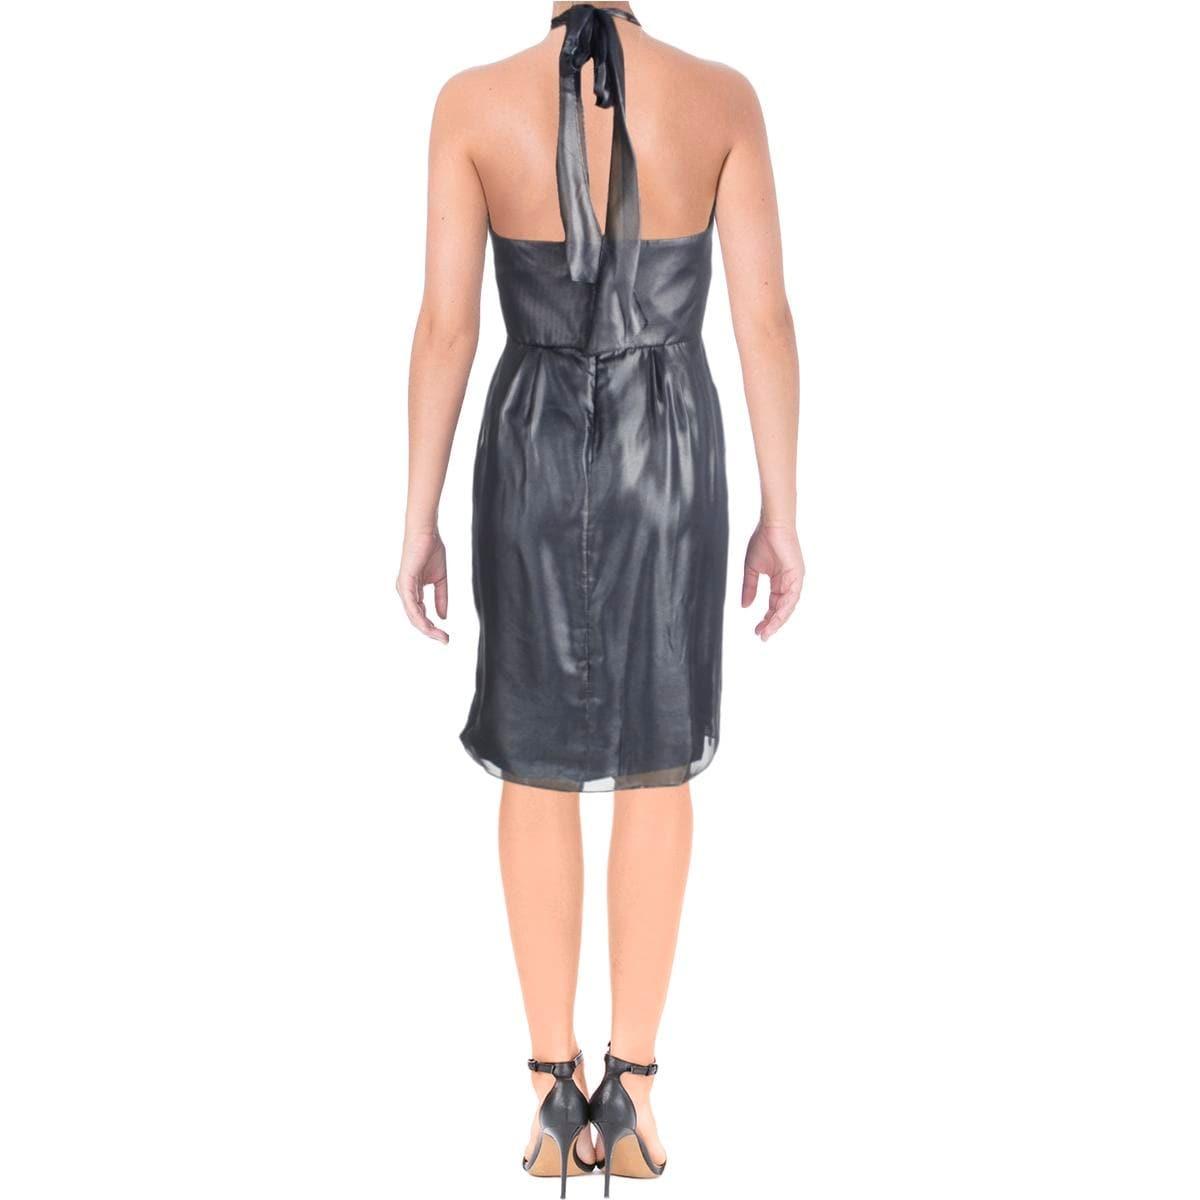 Vera Wang Womens Cocktail Dress Metallic Halter - Free Shipping On ...